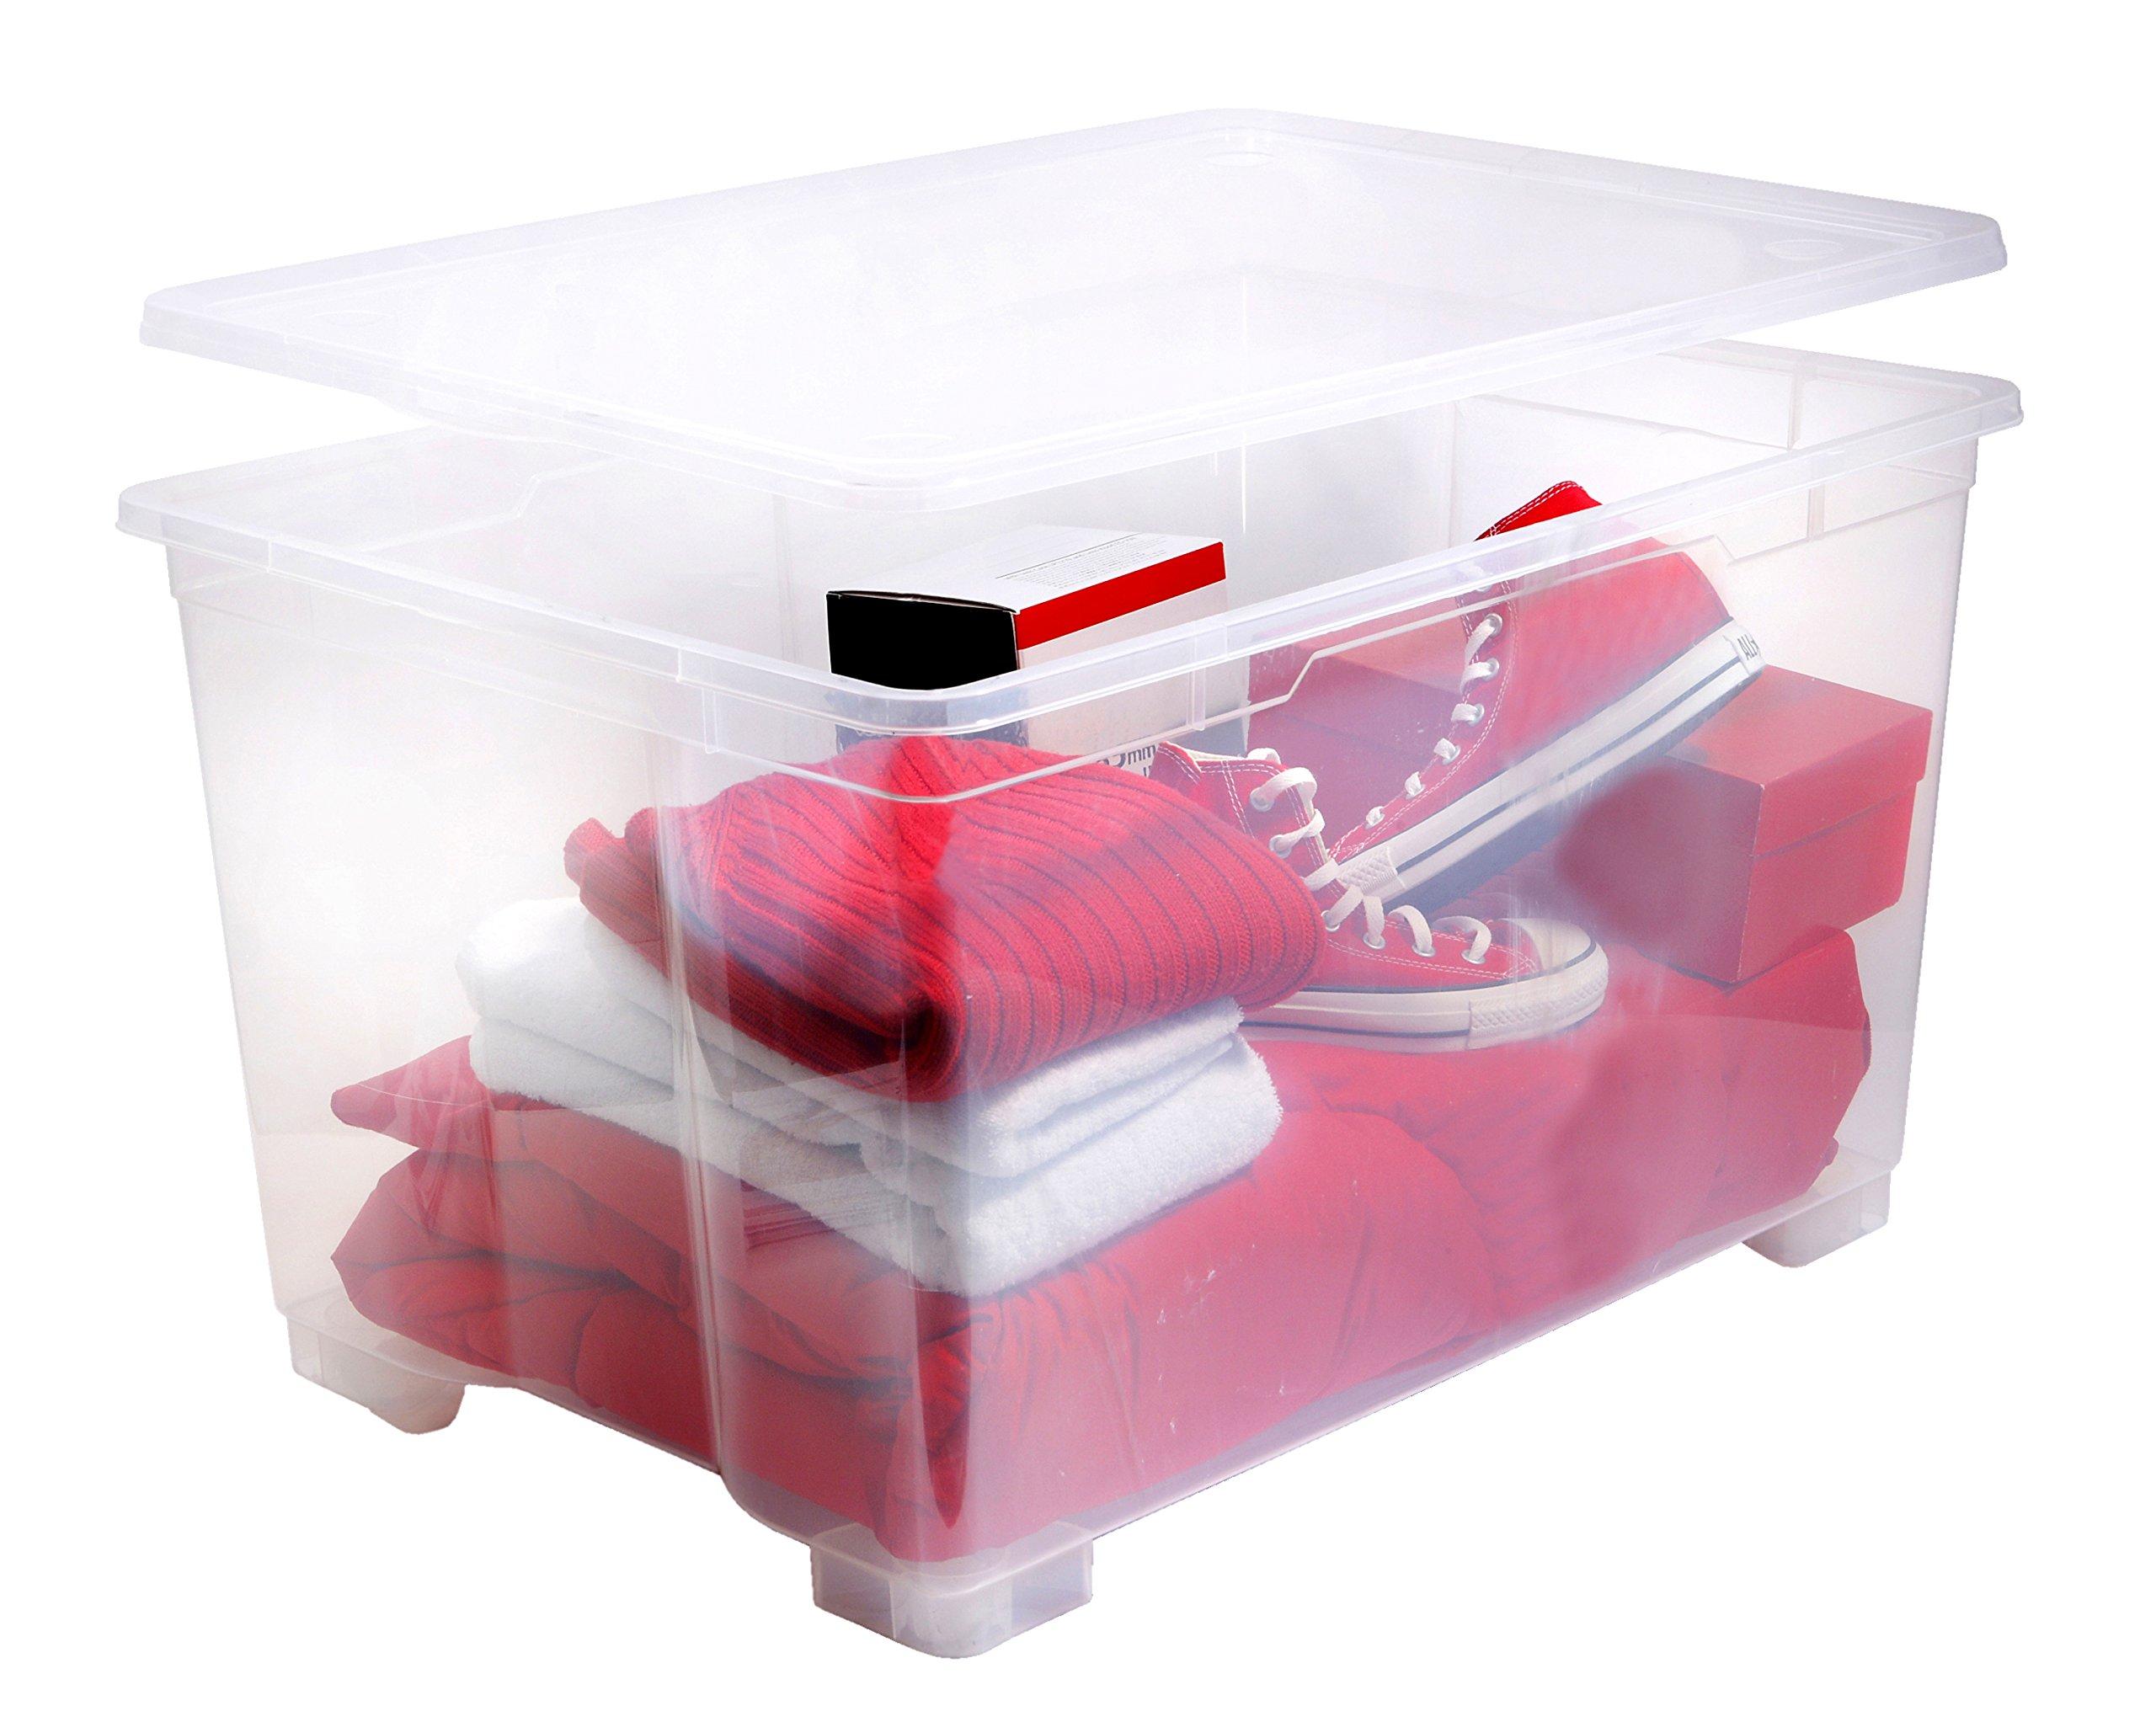 Rotho Sundis 4230001 Cbox Mega Caja Polipropileno Transparente 78 x 56 x 45 cm product image